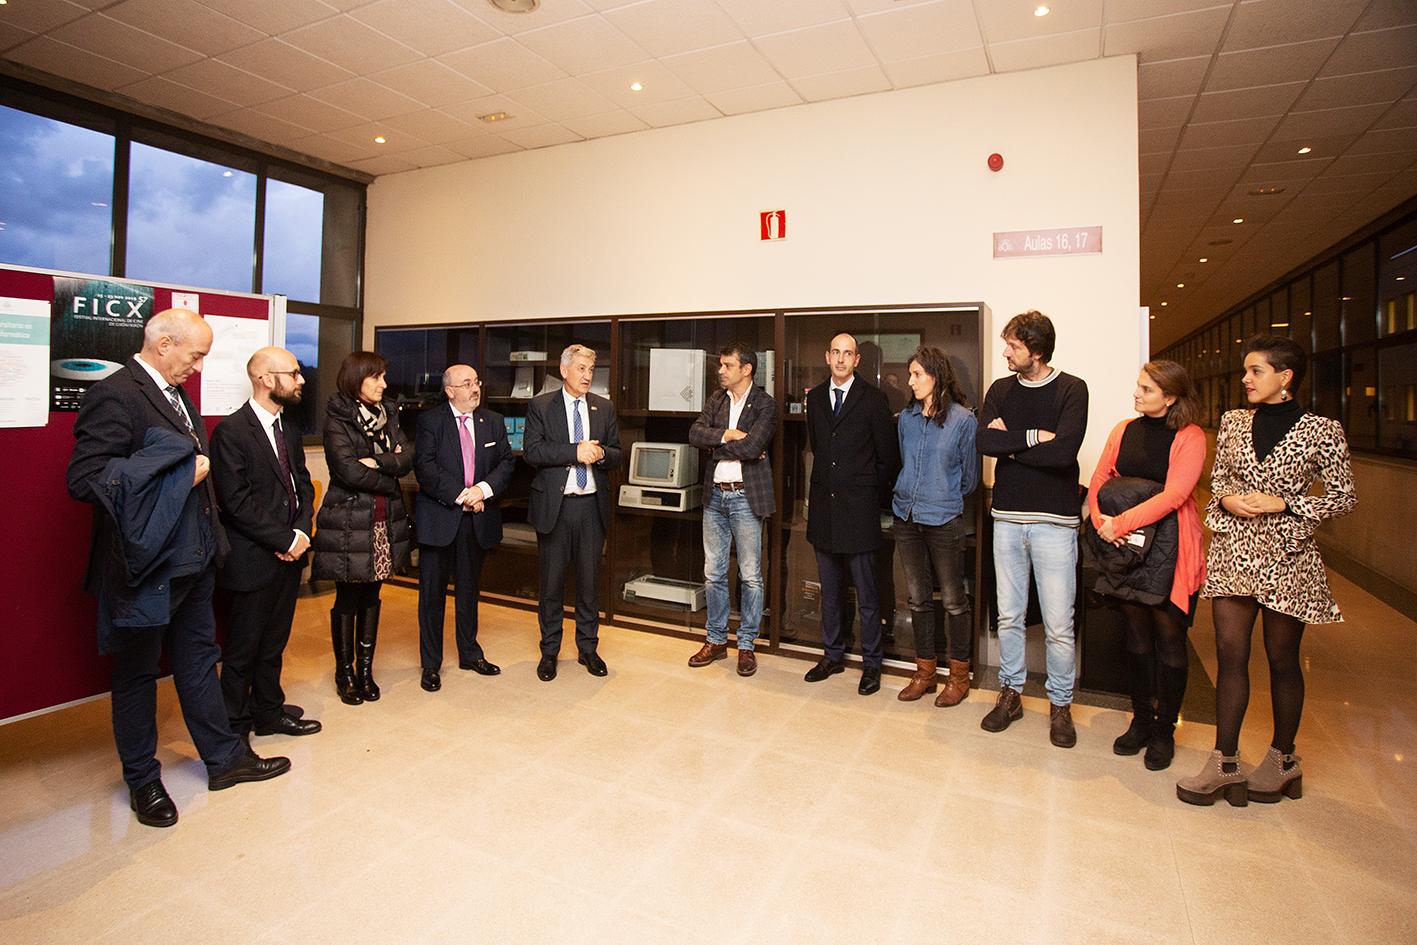 Universidad para peques inauguración Gijón